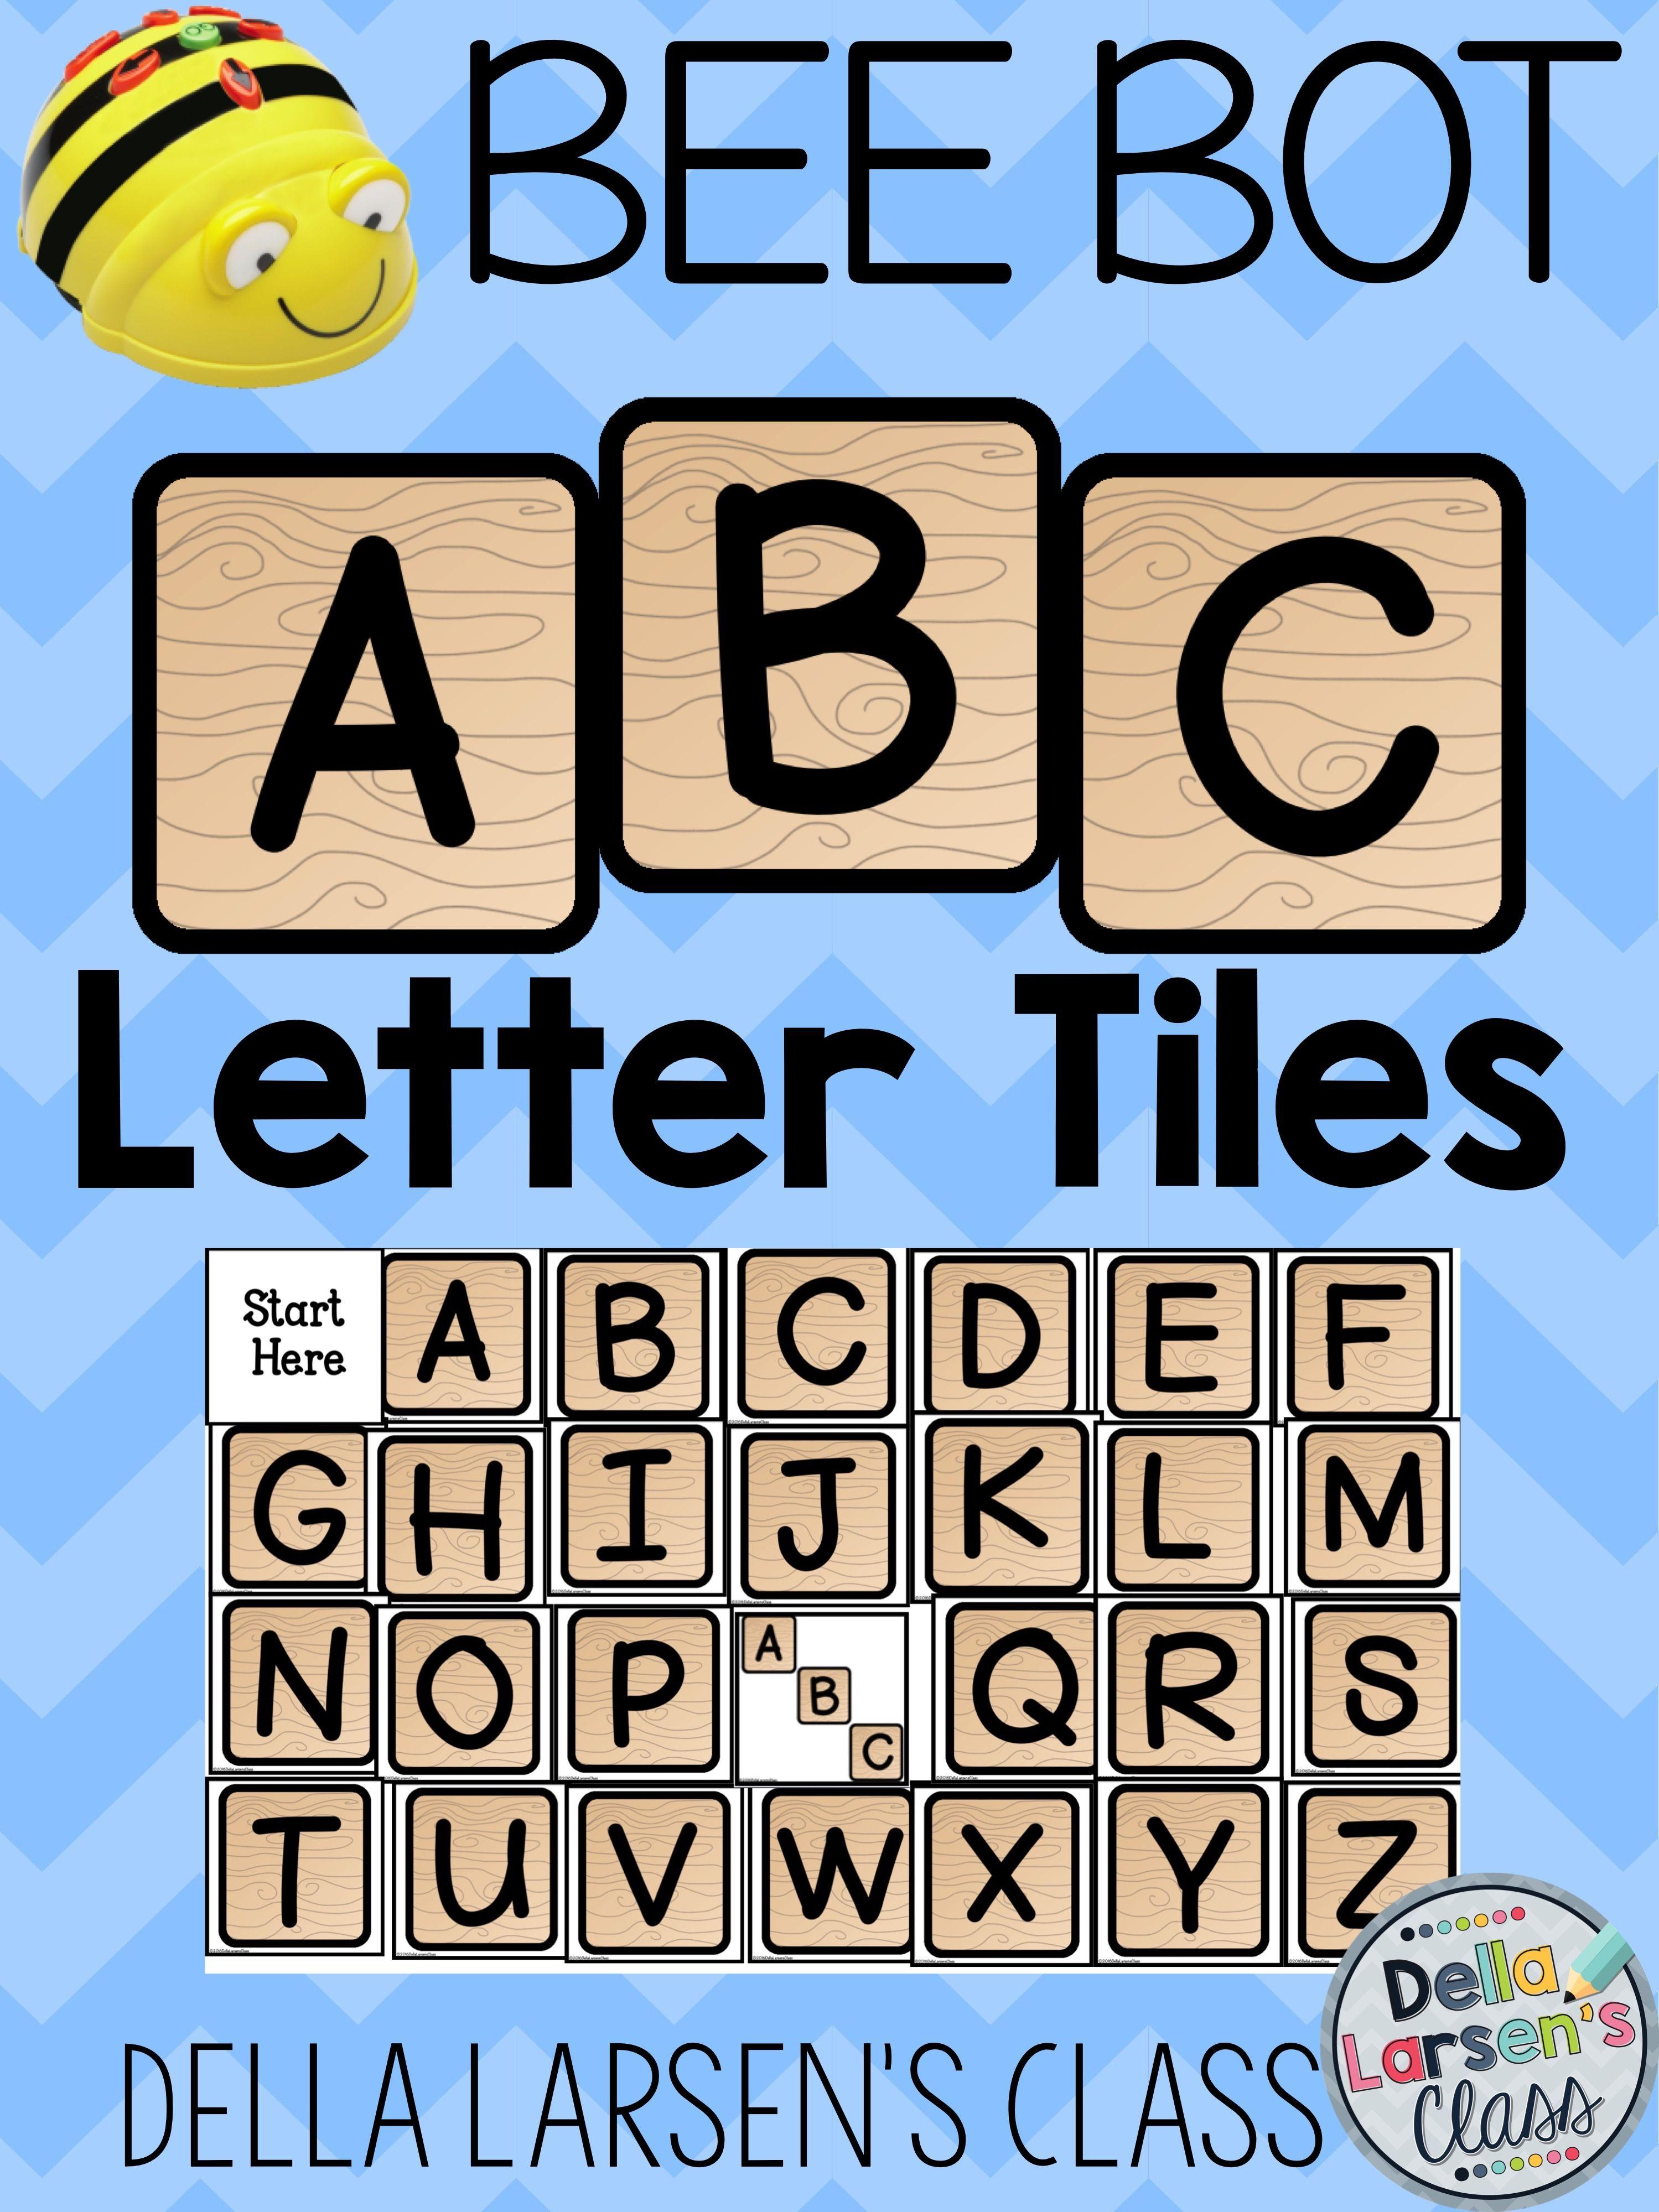 Bee Bot Abc Alphabet Letter Tiles